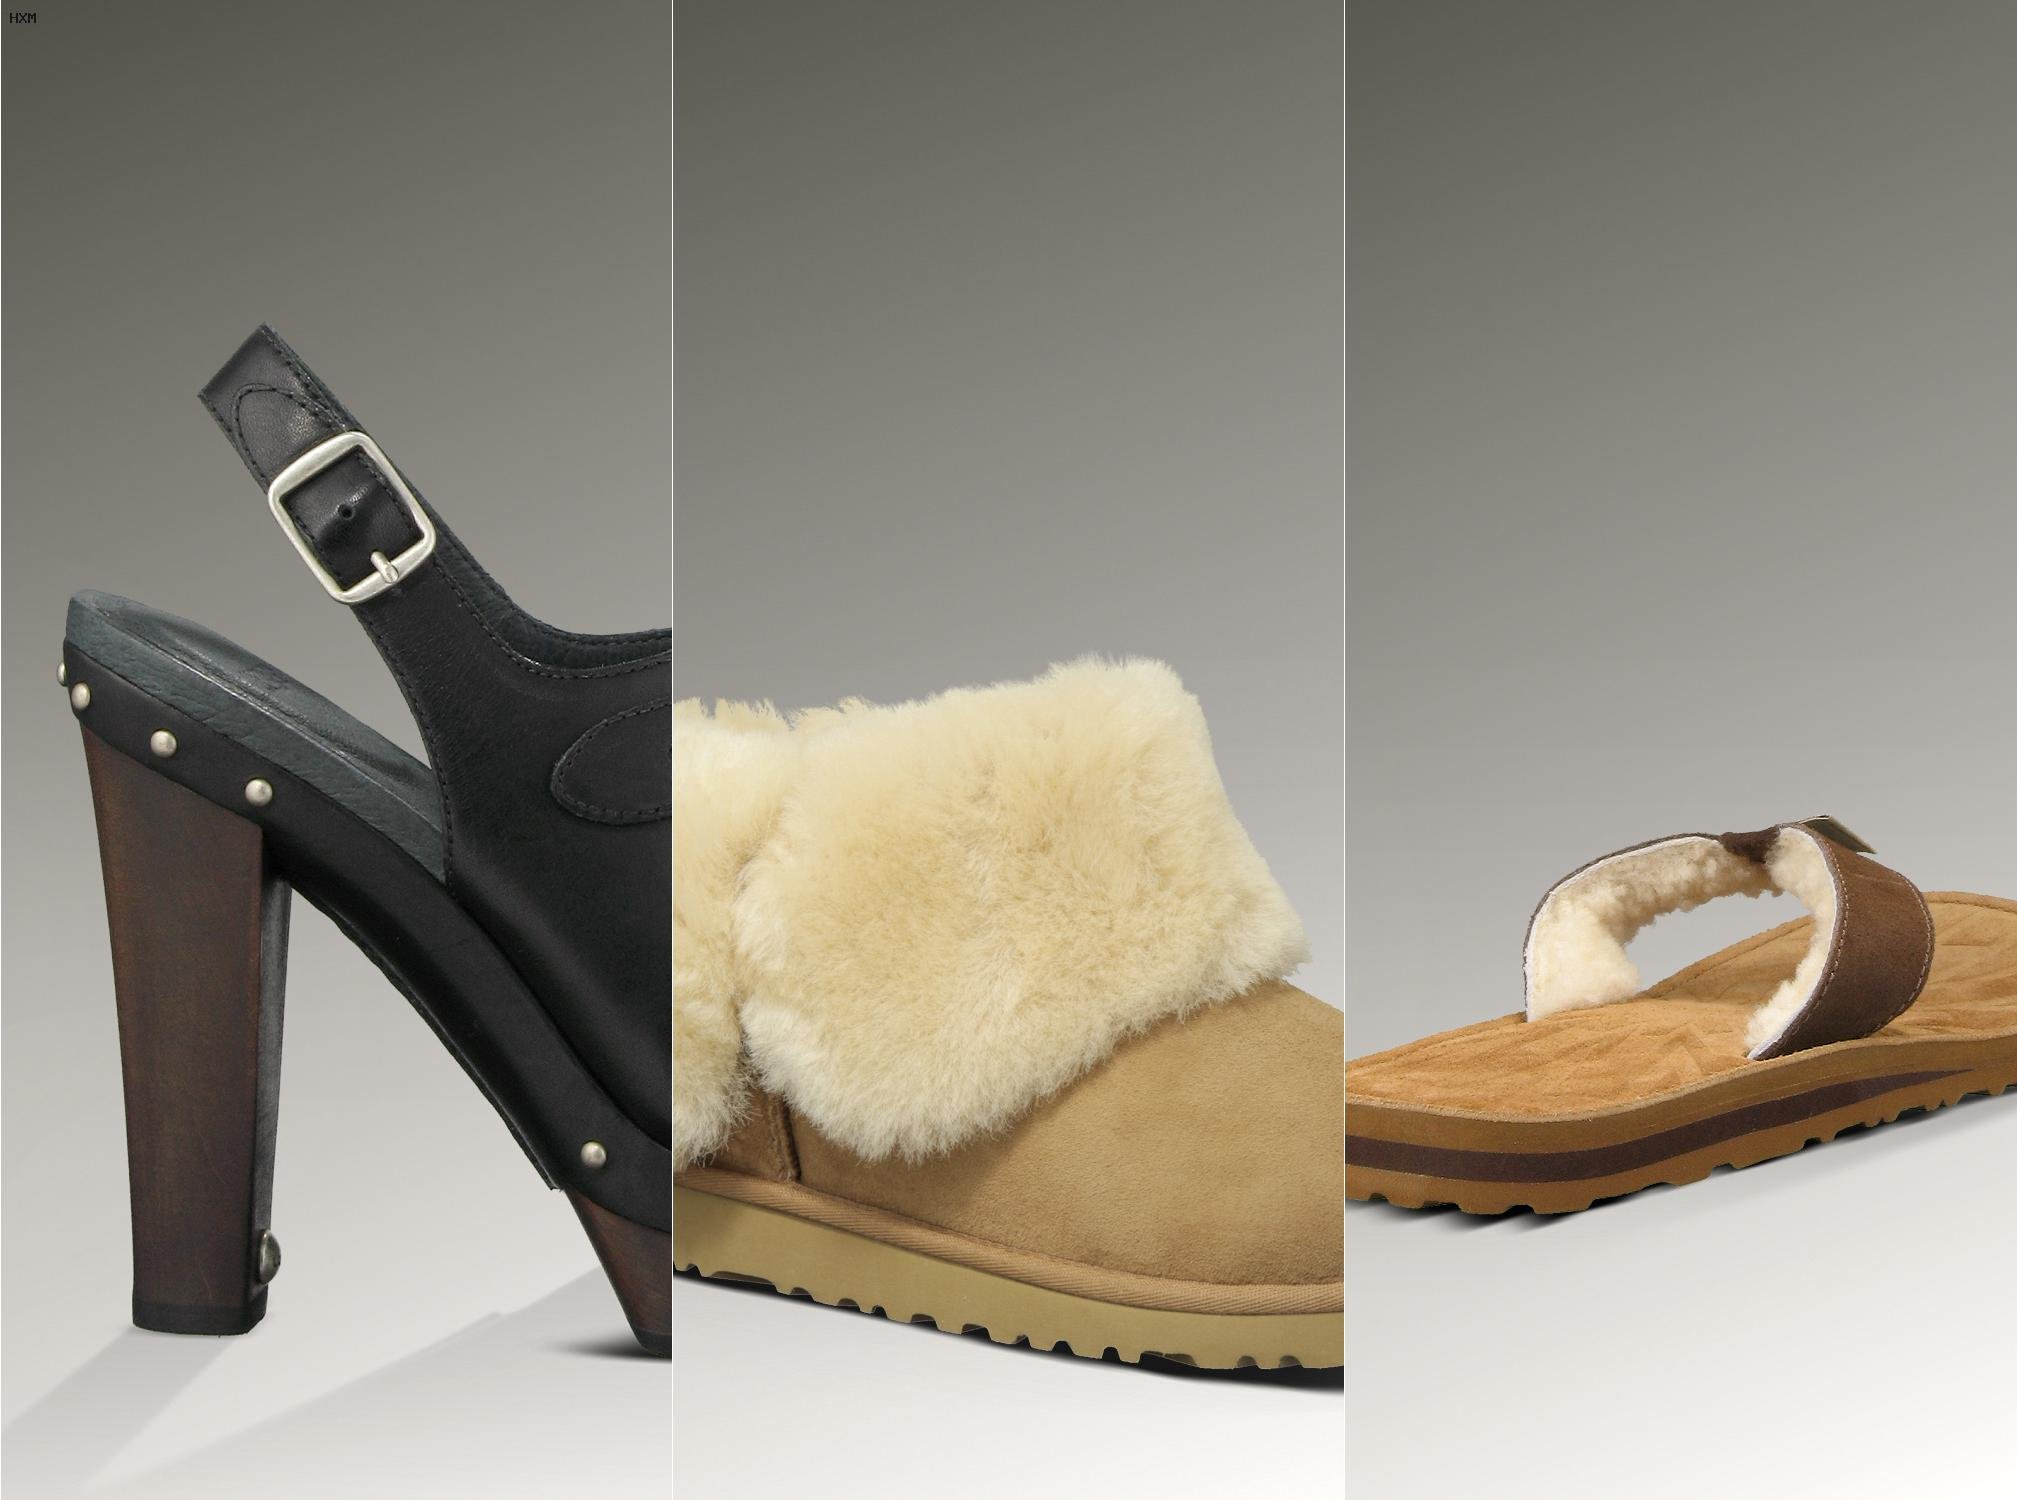 scarpe imitazione ugg